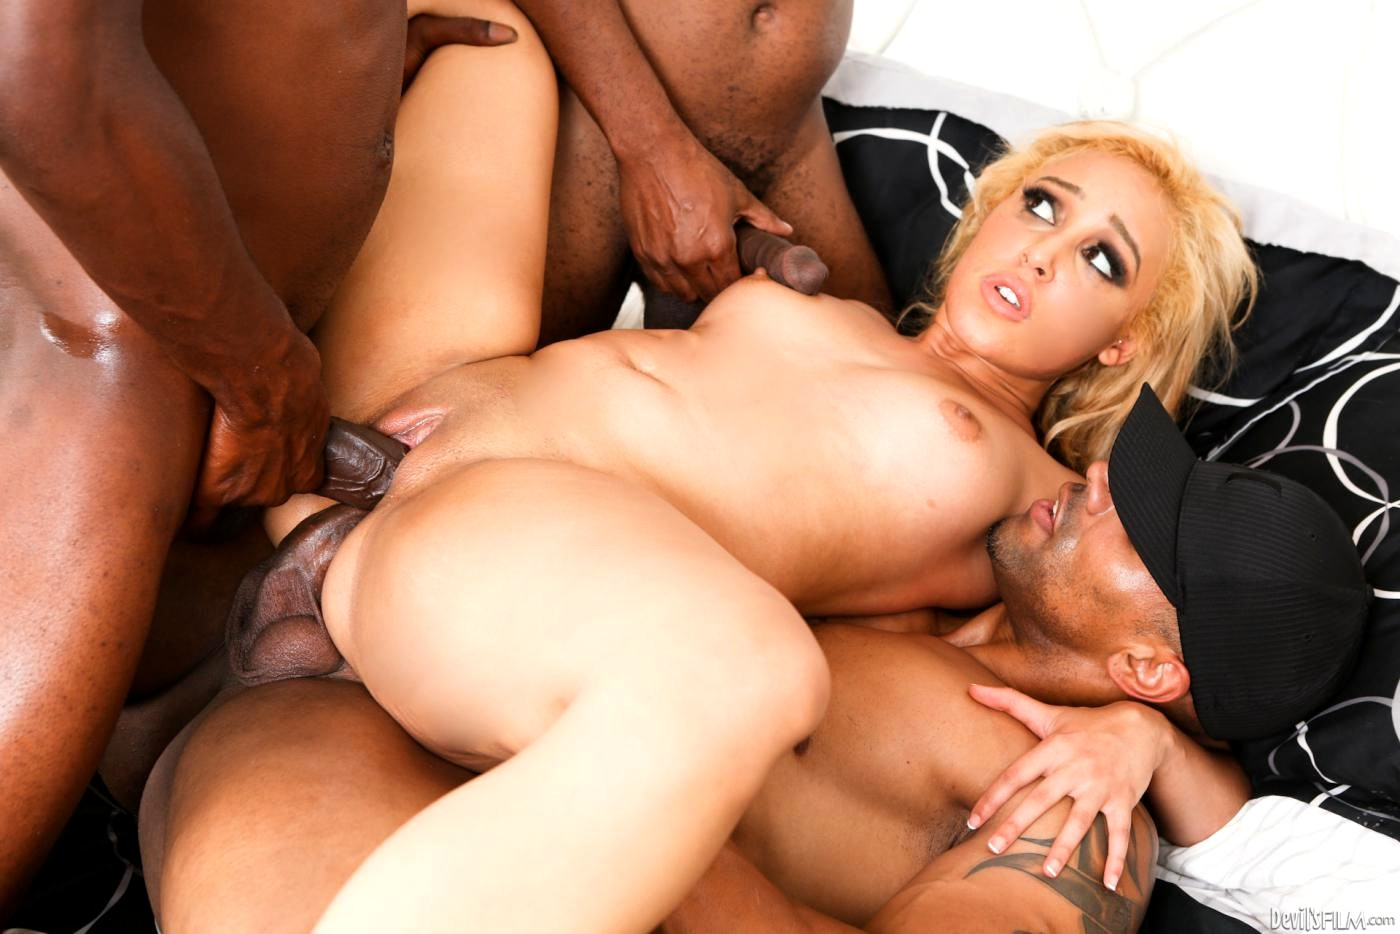 Big jugs blonde whore sarah vandella interracial dp action free mobile porn photo